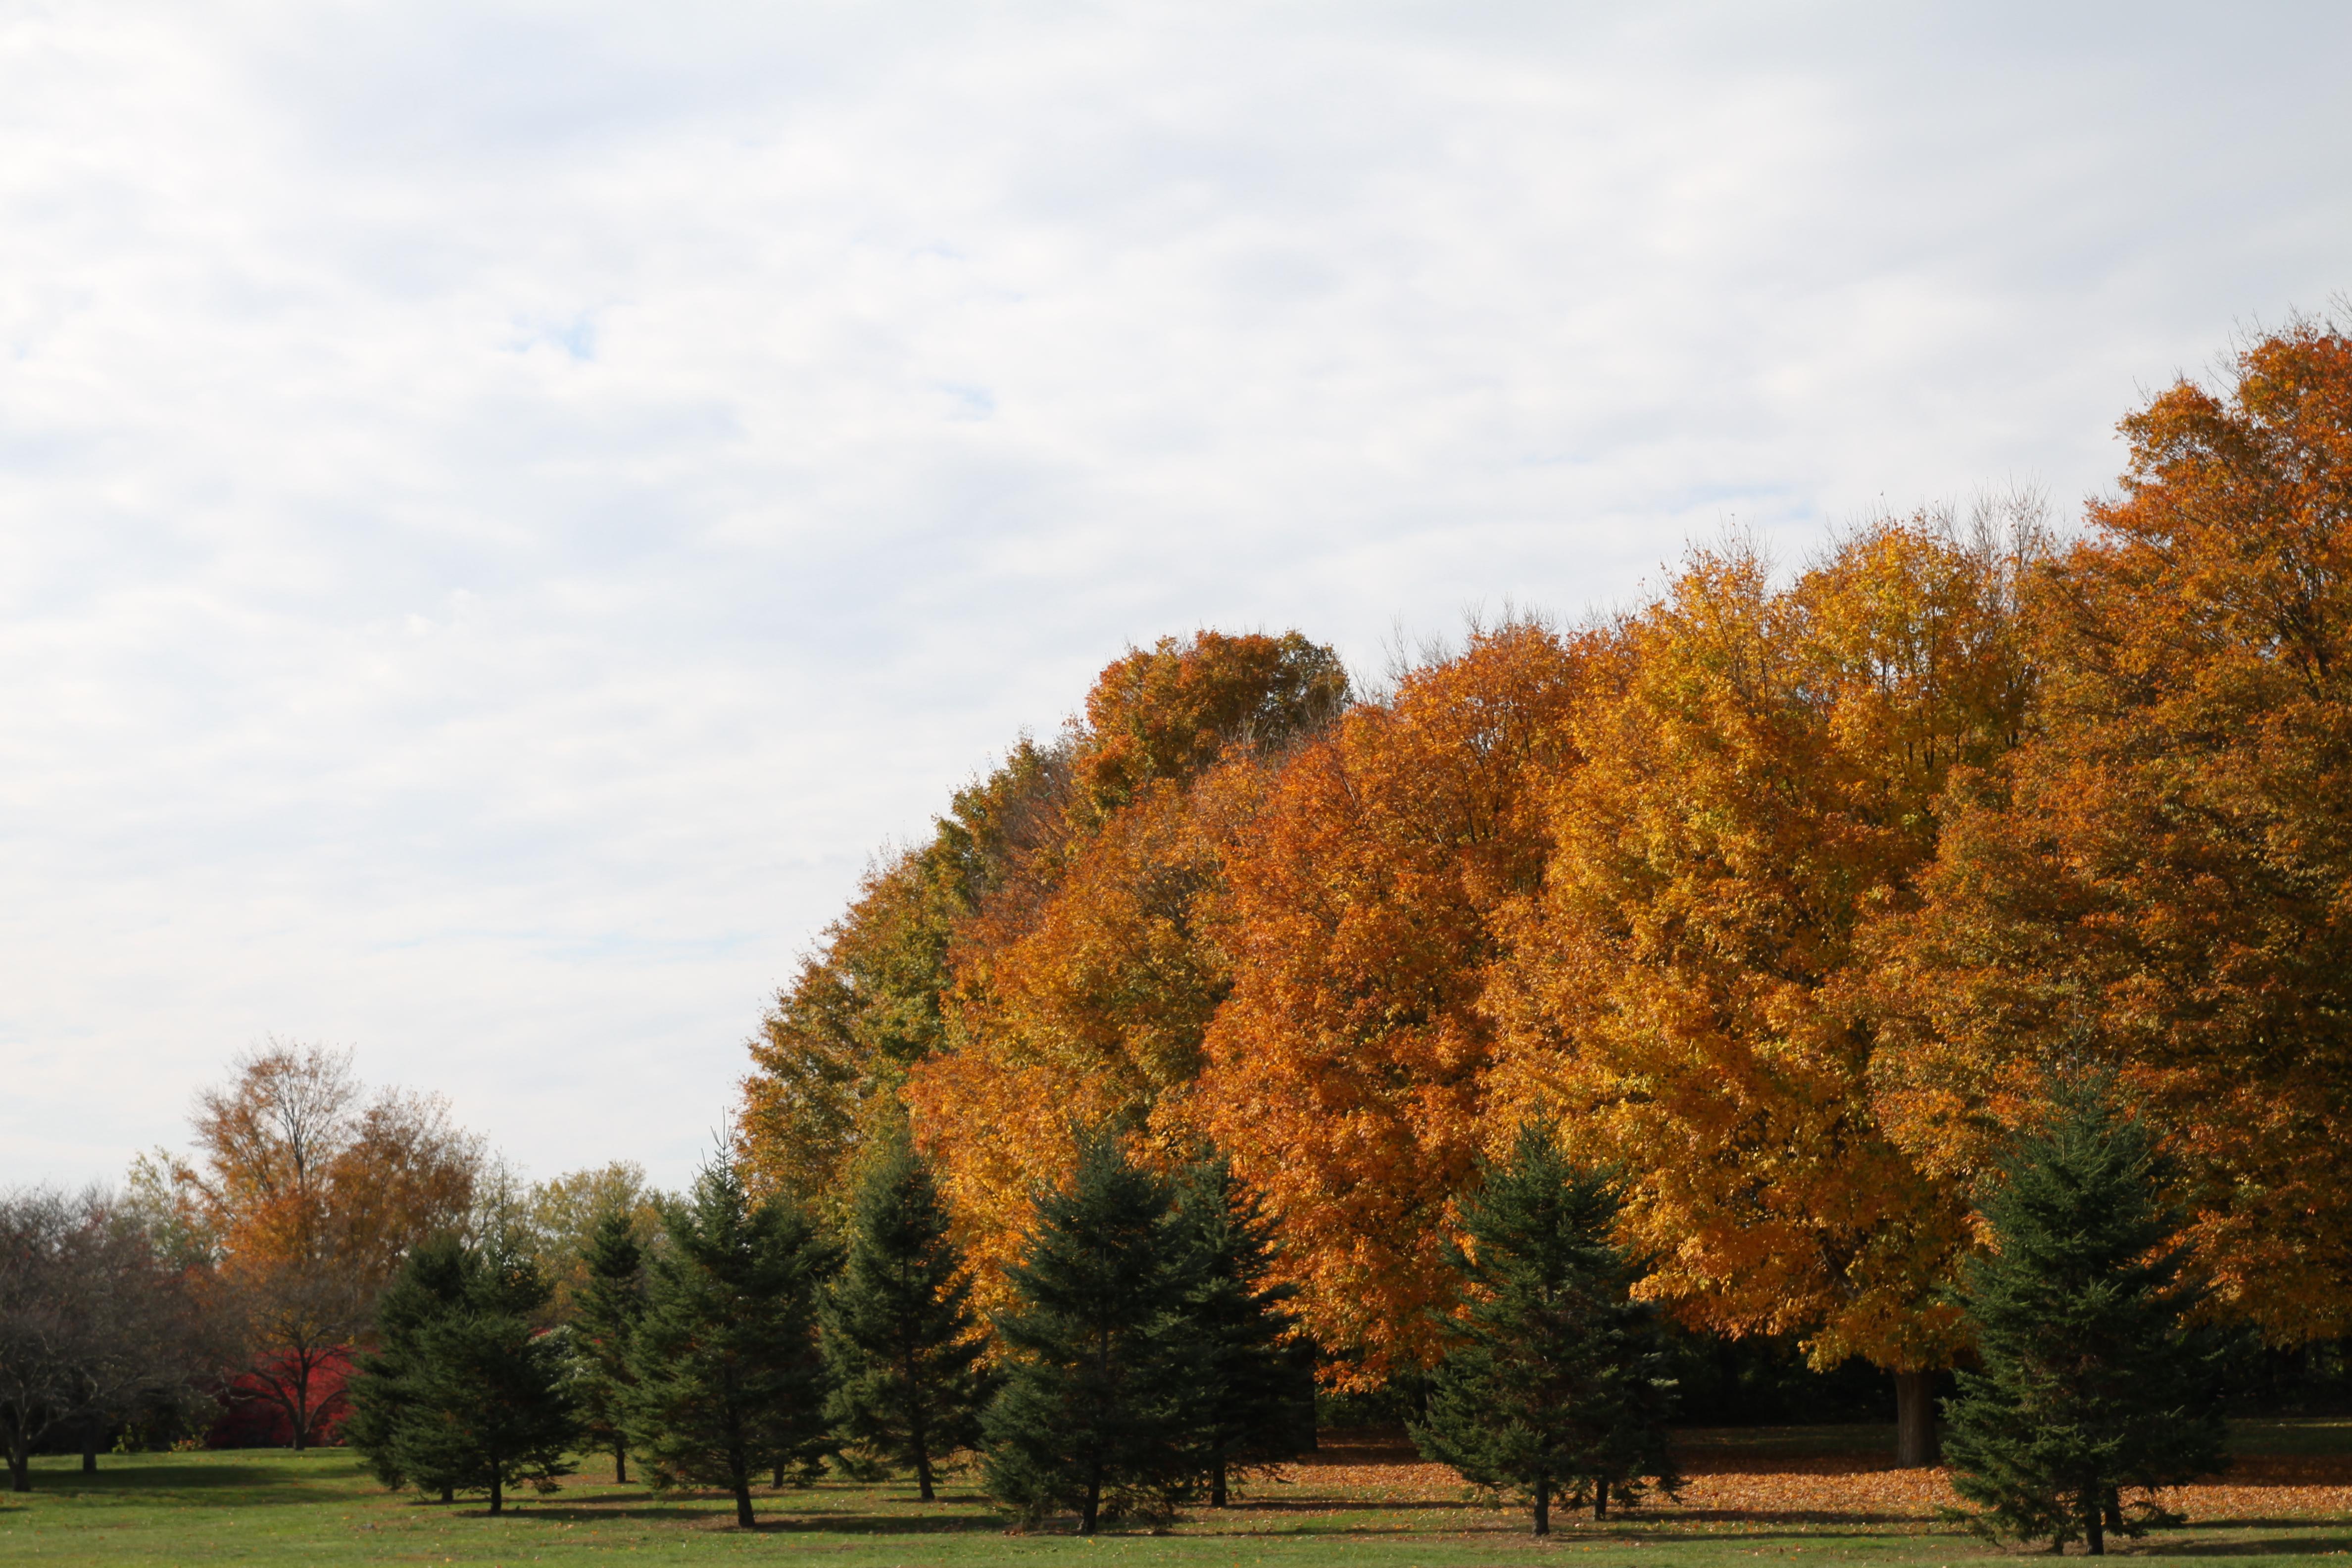 7298 fall foliage colt state park crJenniferBalch